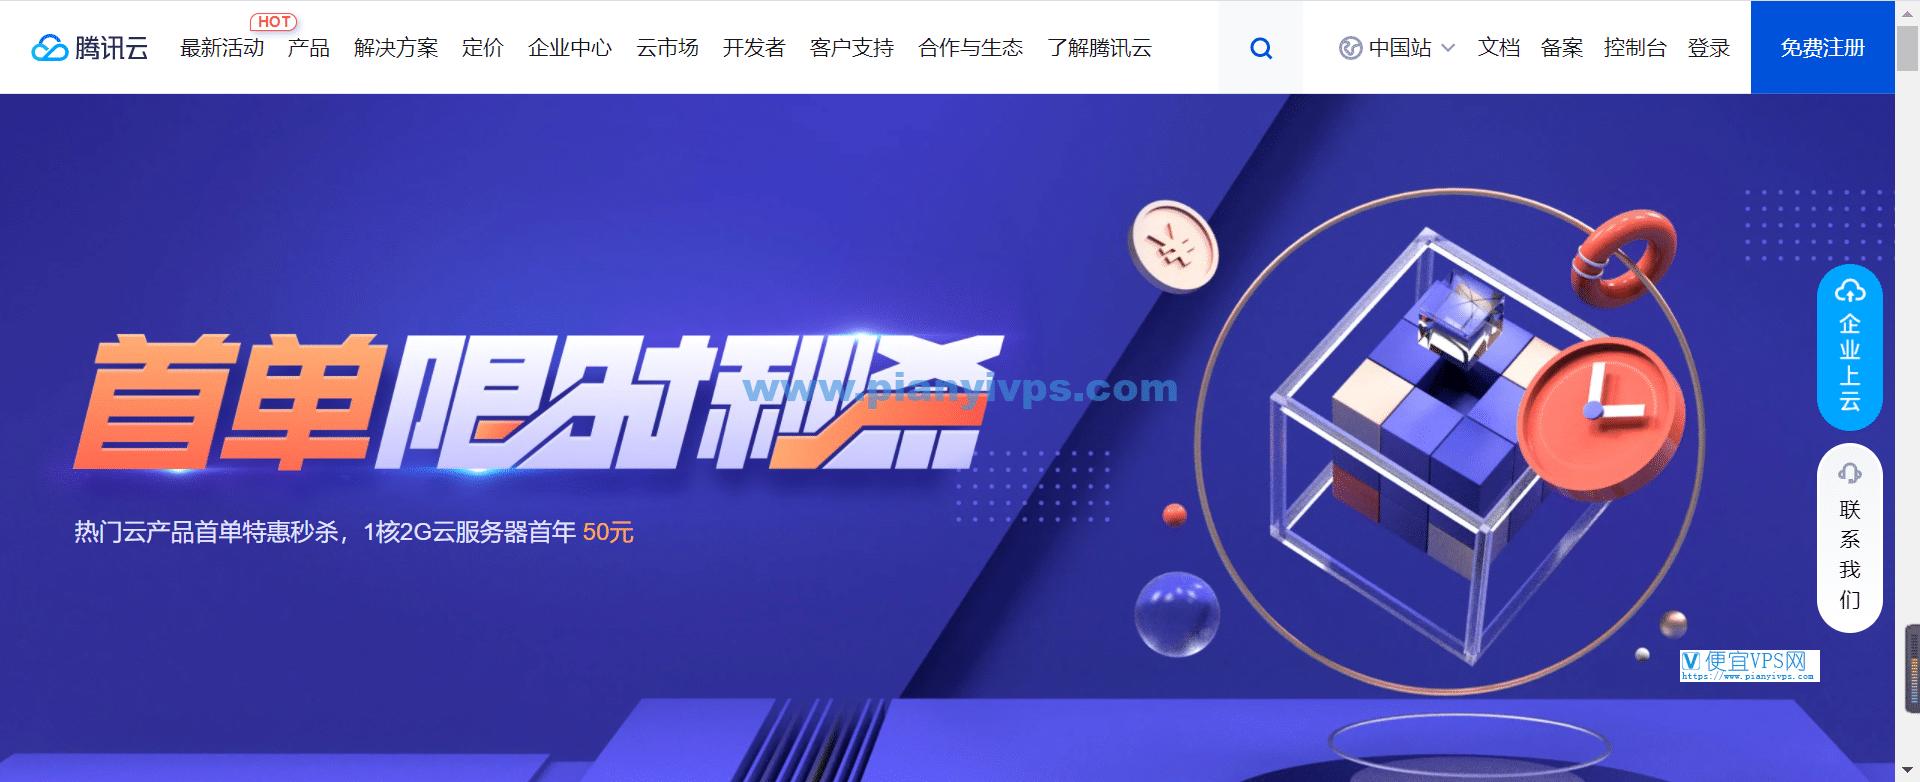 Tencent cloud 首单秒杀